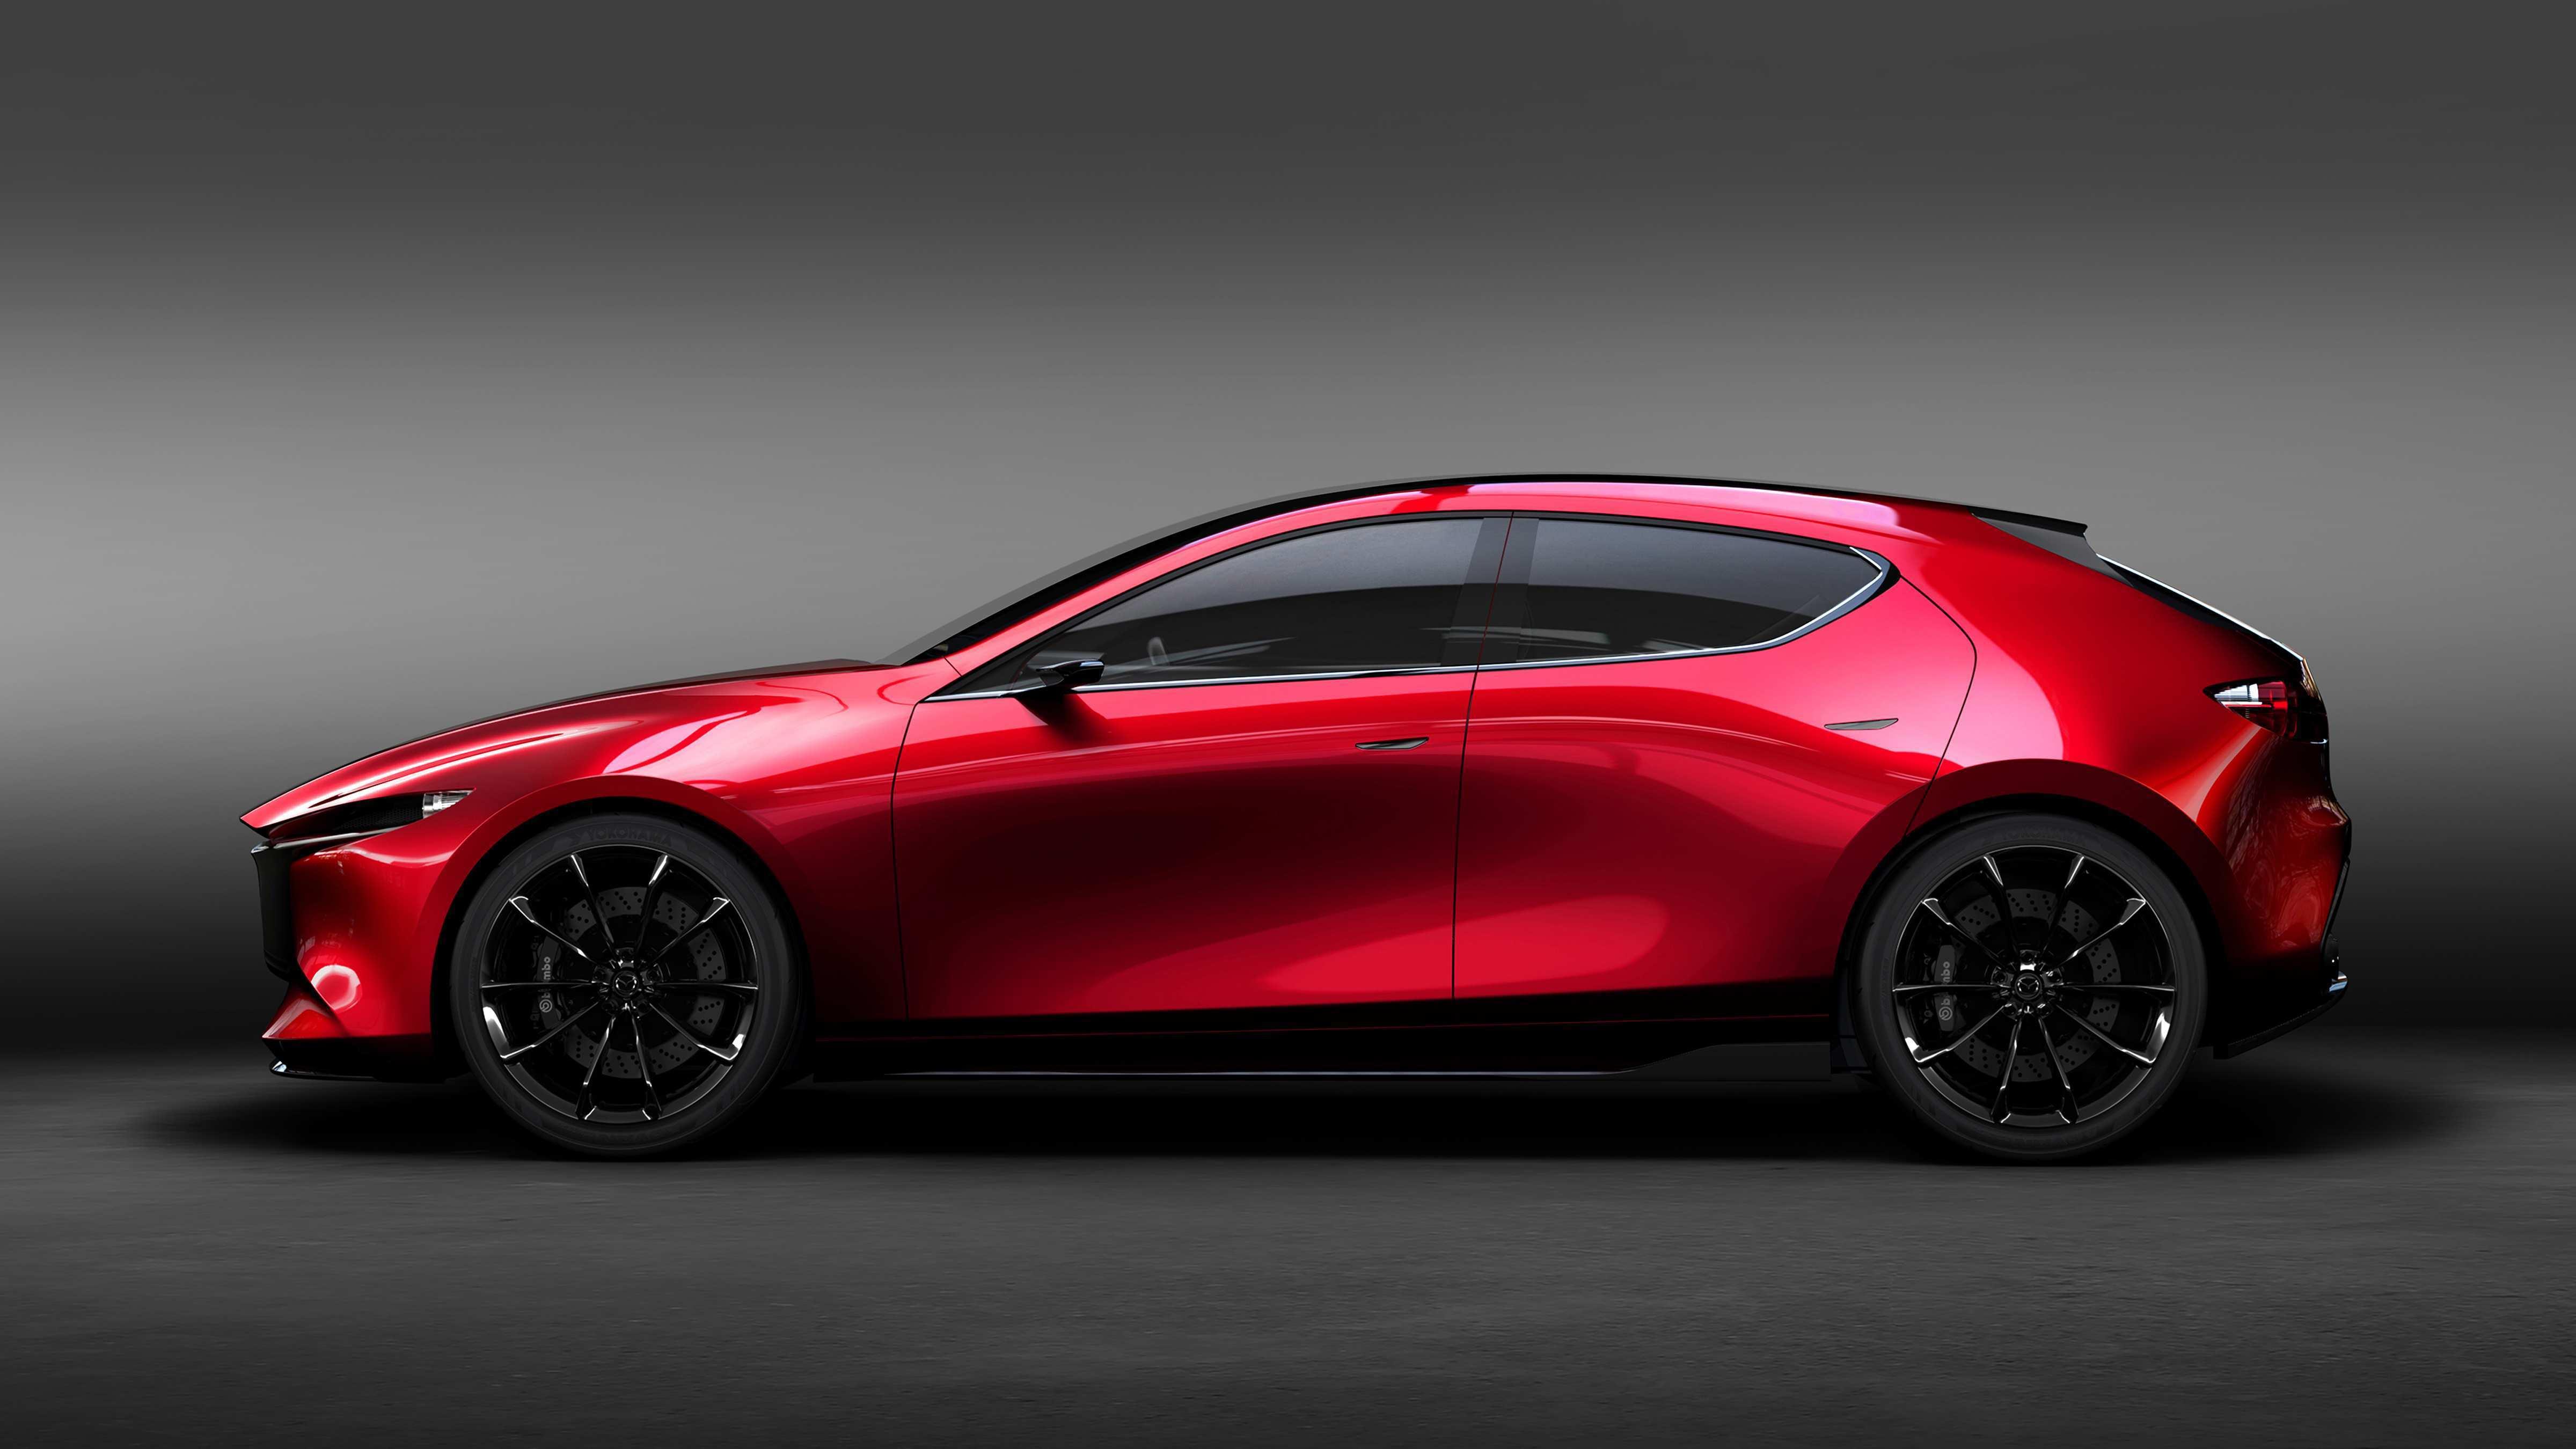 37 New Mazda Kai 2019 Redesign and Concept for Mazda Kai 2019